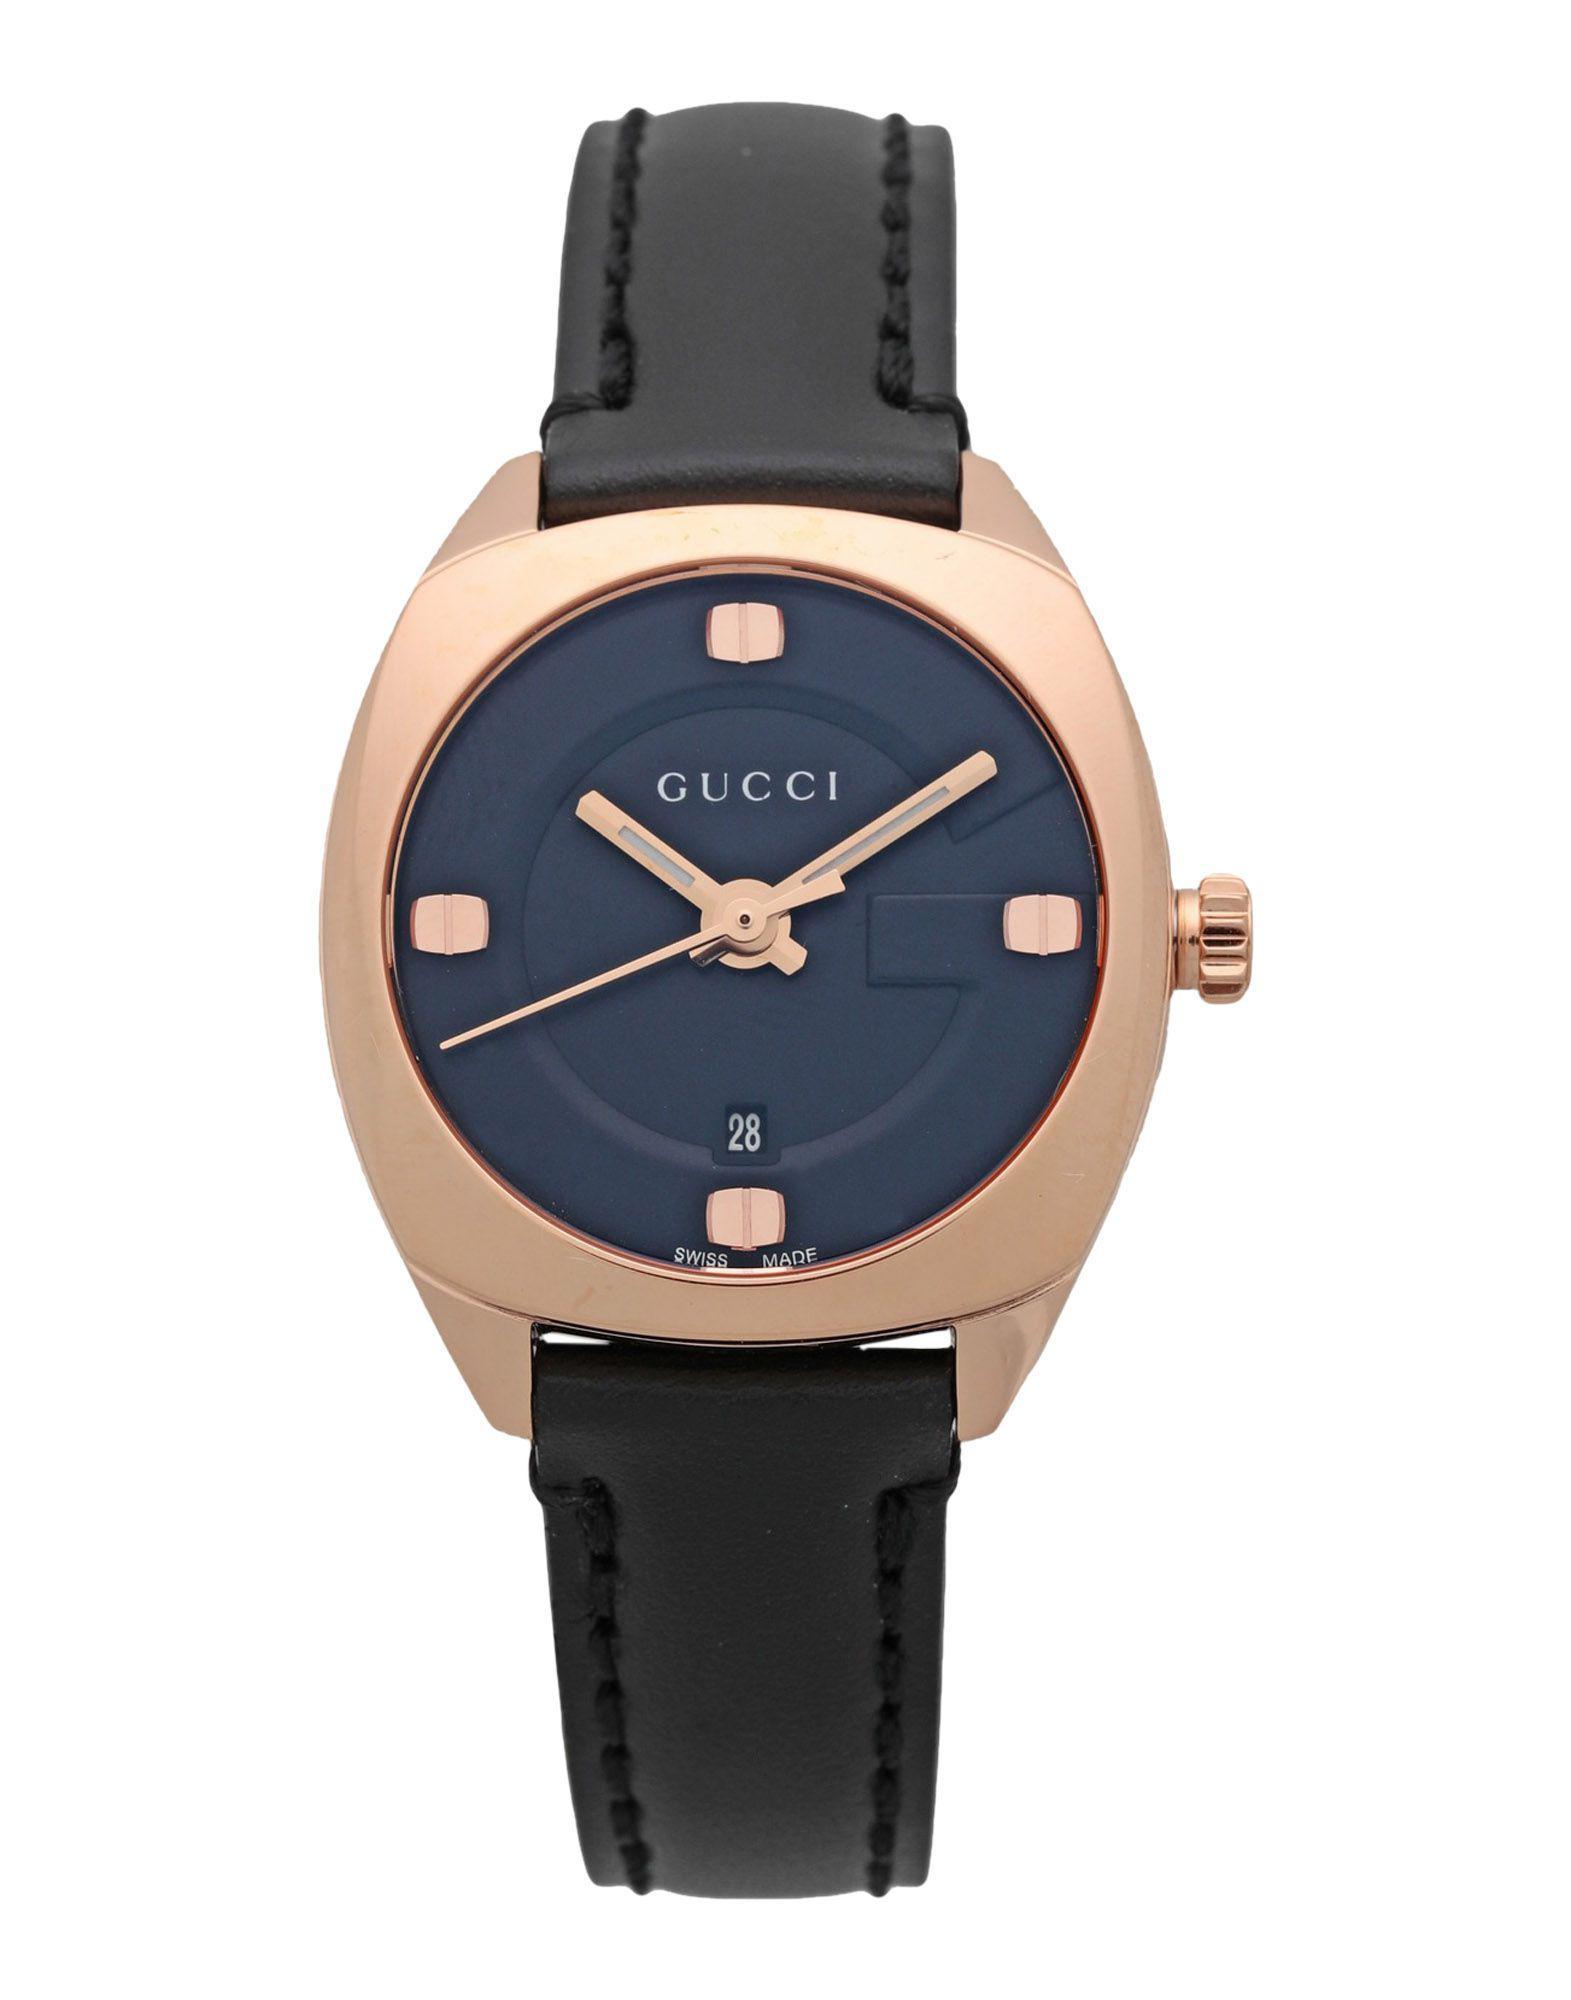 Gucci Wrist Watch in Black - Lyst